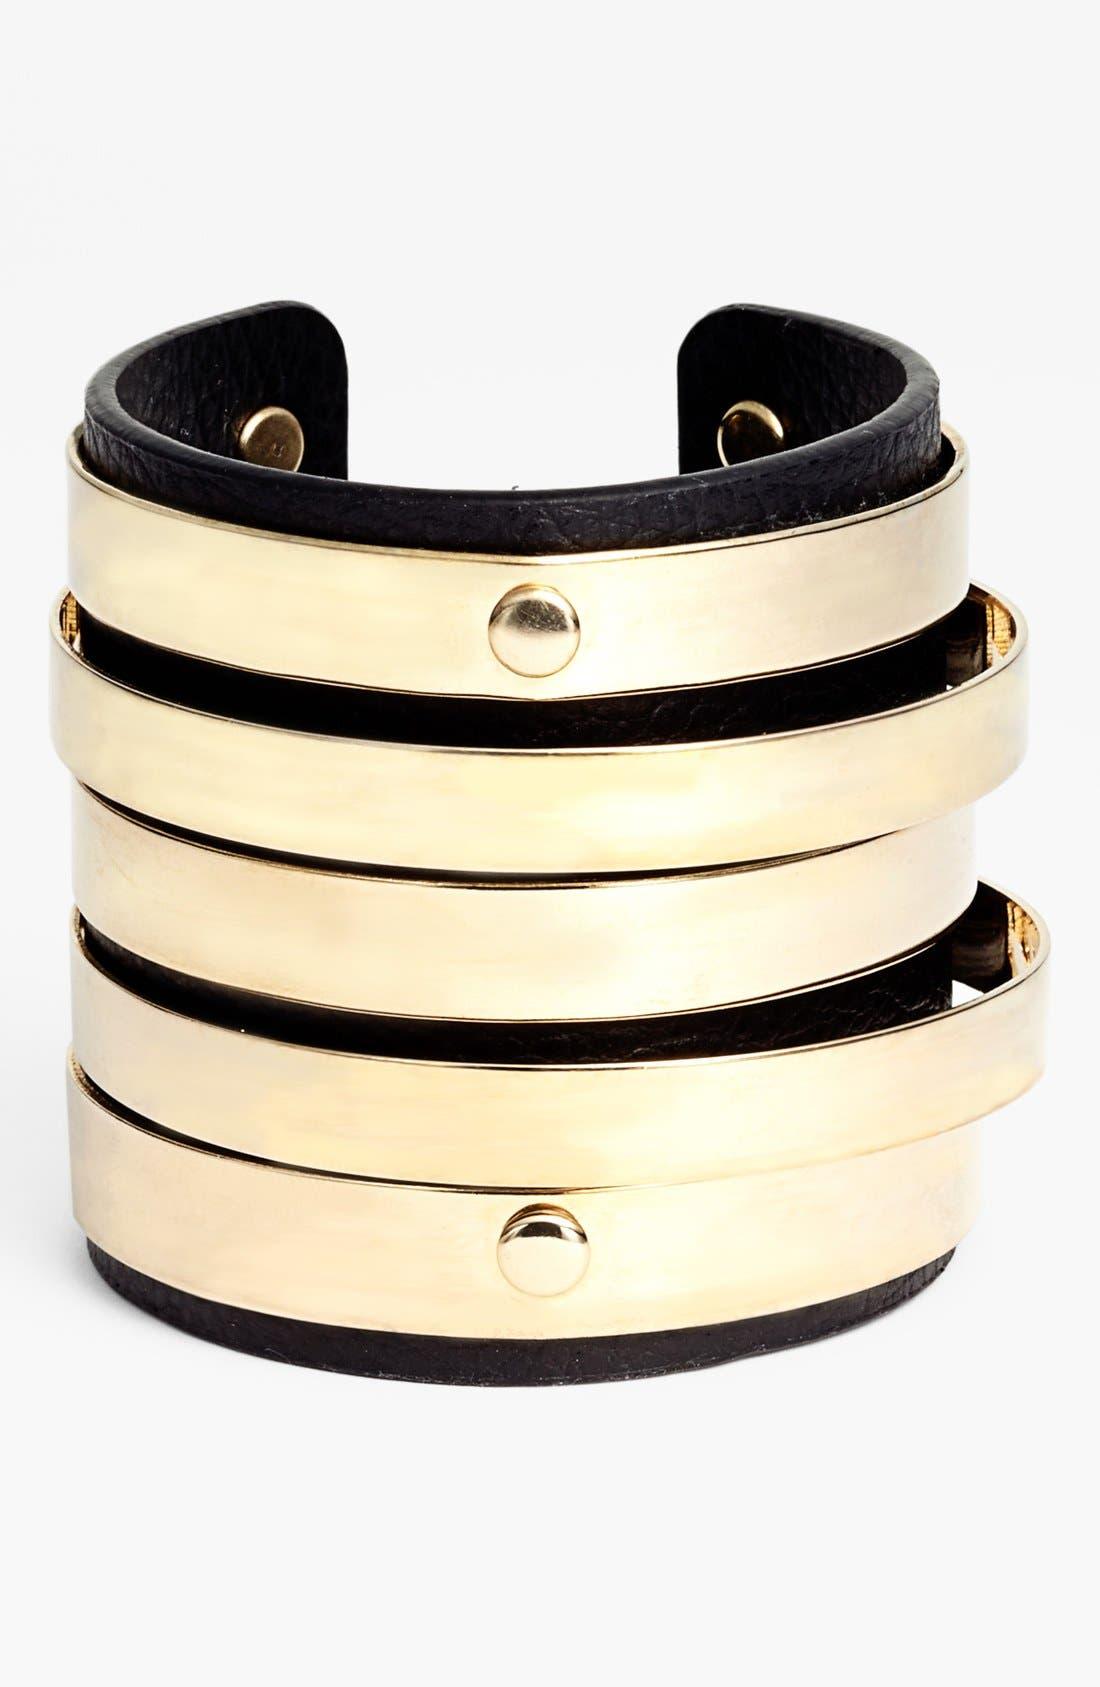 Main Image - Cara Couture 'Gold Bar' Cuff